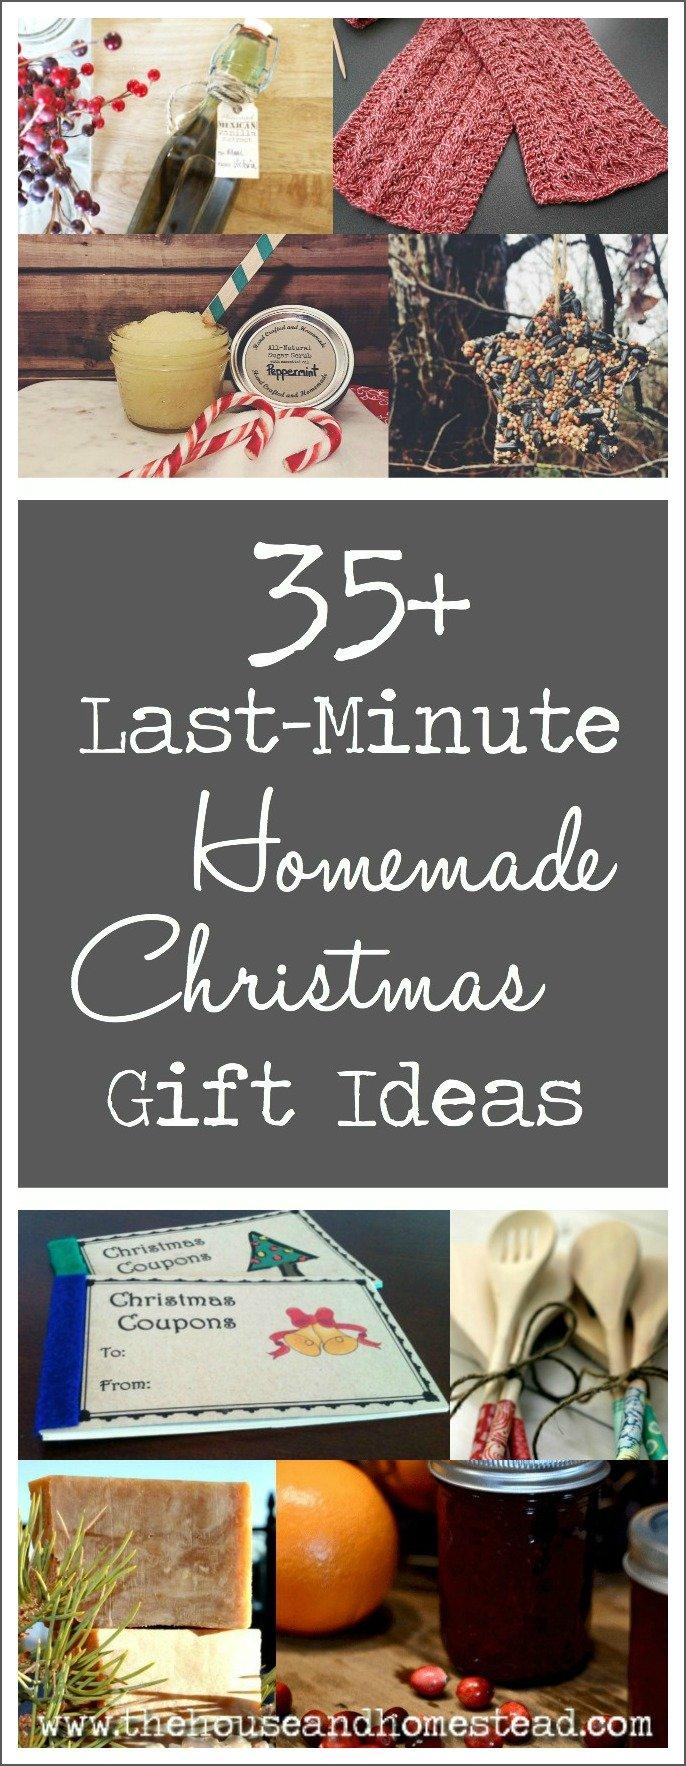 35+ Last-Minute Homemade Christmas Gift Ideas   The House & Homestead